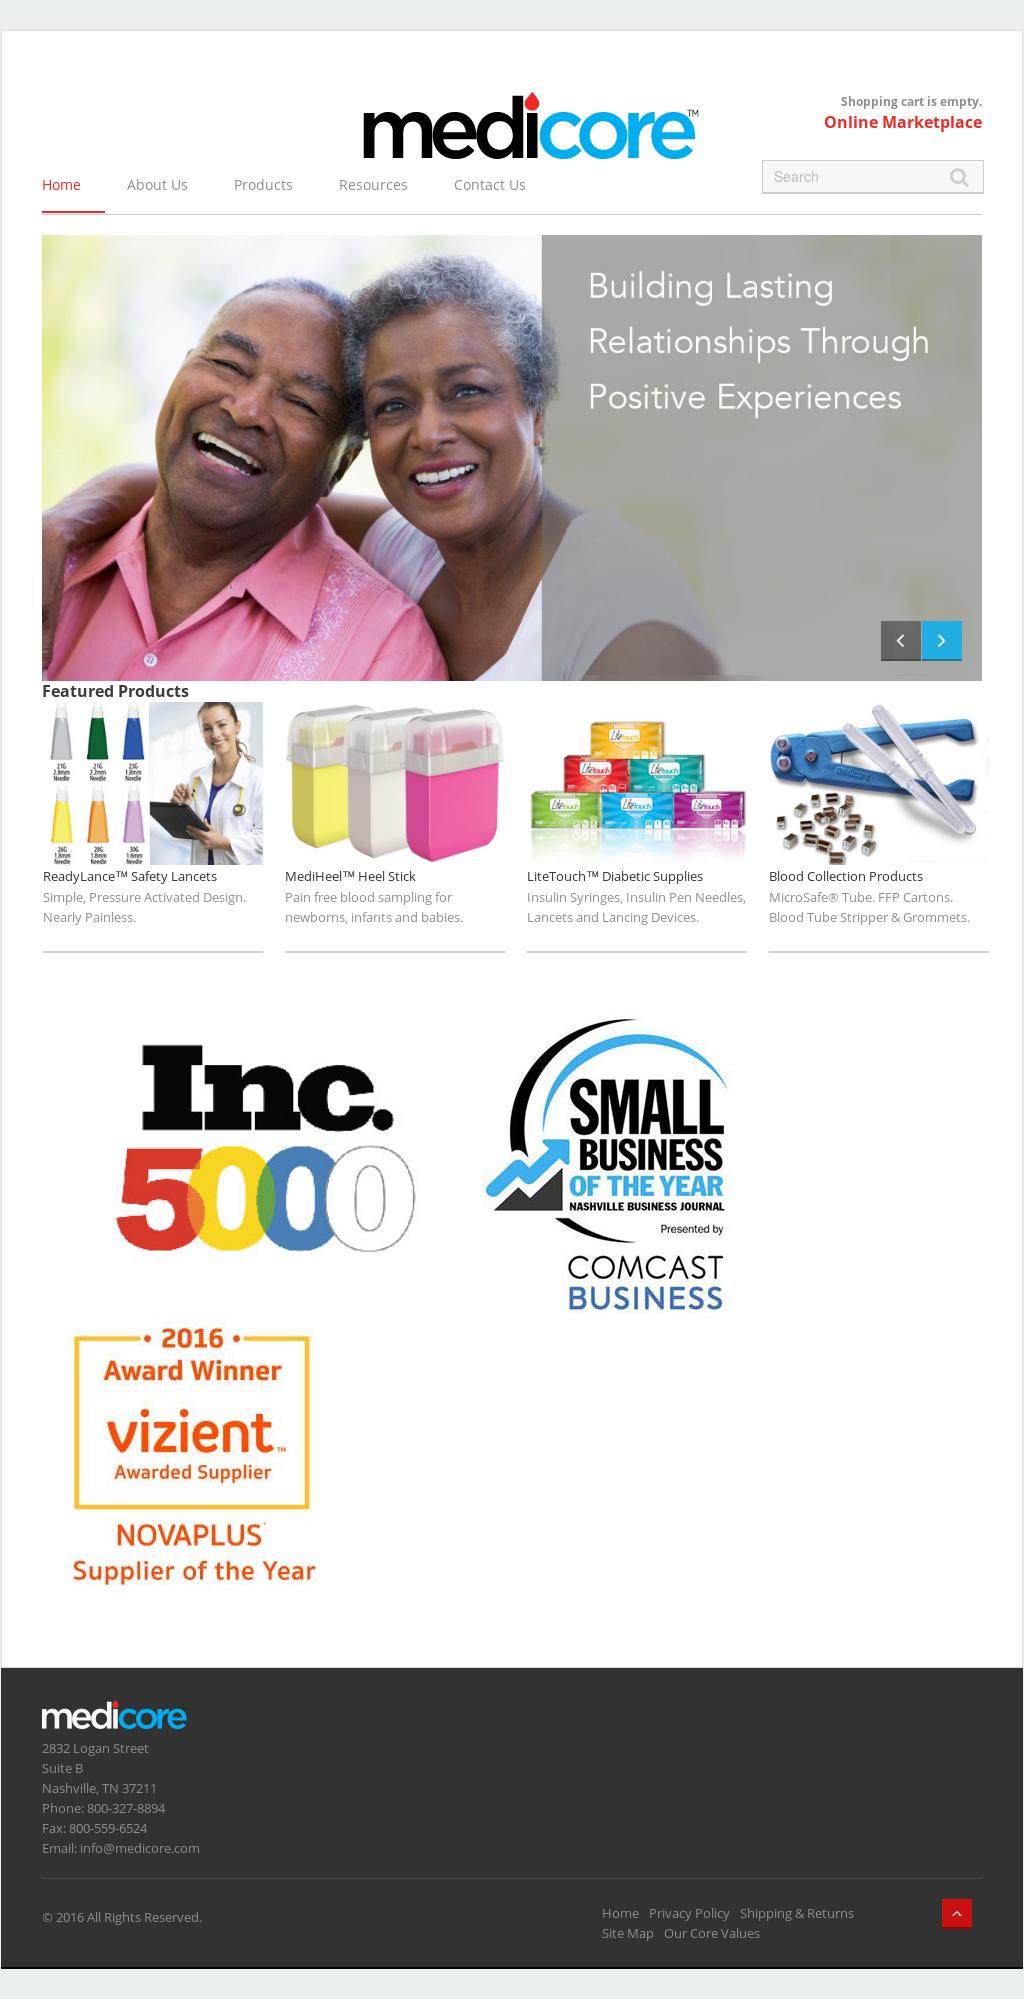 MediCore Competitors, Revenue and Employees - Owler Company Profile